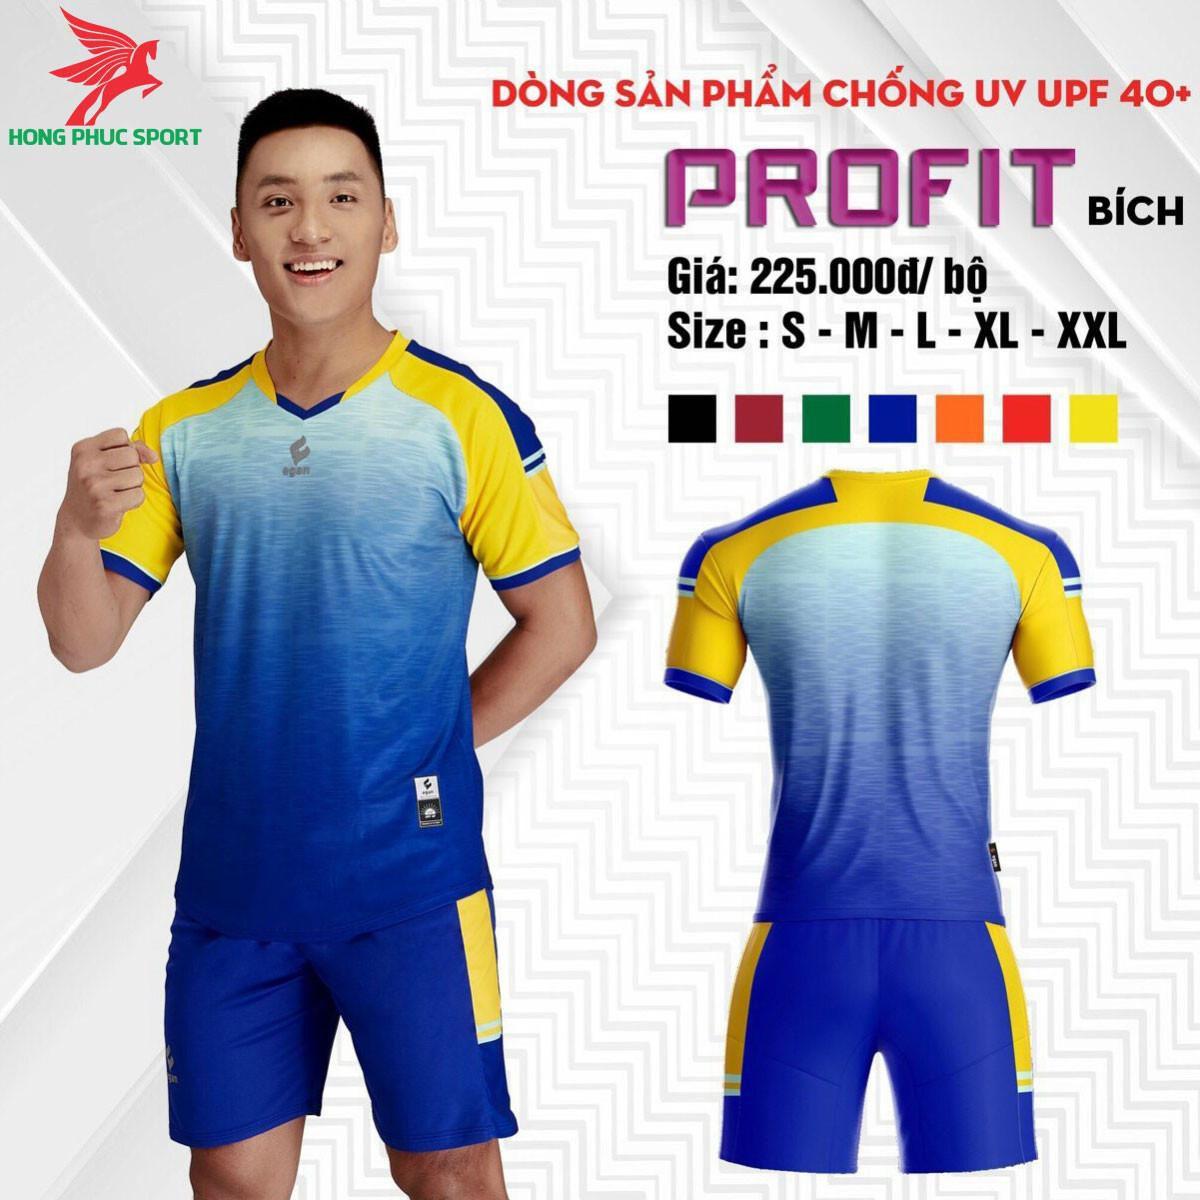 https://cdn.hongphucsport.com/unsafe/s4.shopbay.vn/files/285/ao-da-bong-khong-logo-egan-profit-mau-xanh-bich-6050664a3e1c4.jpg